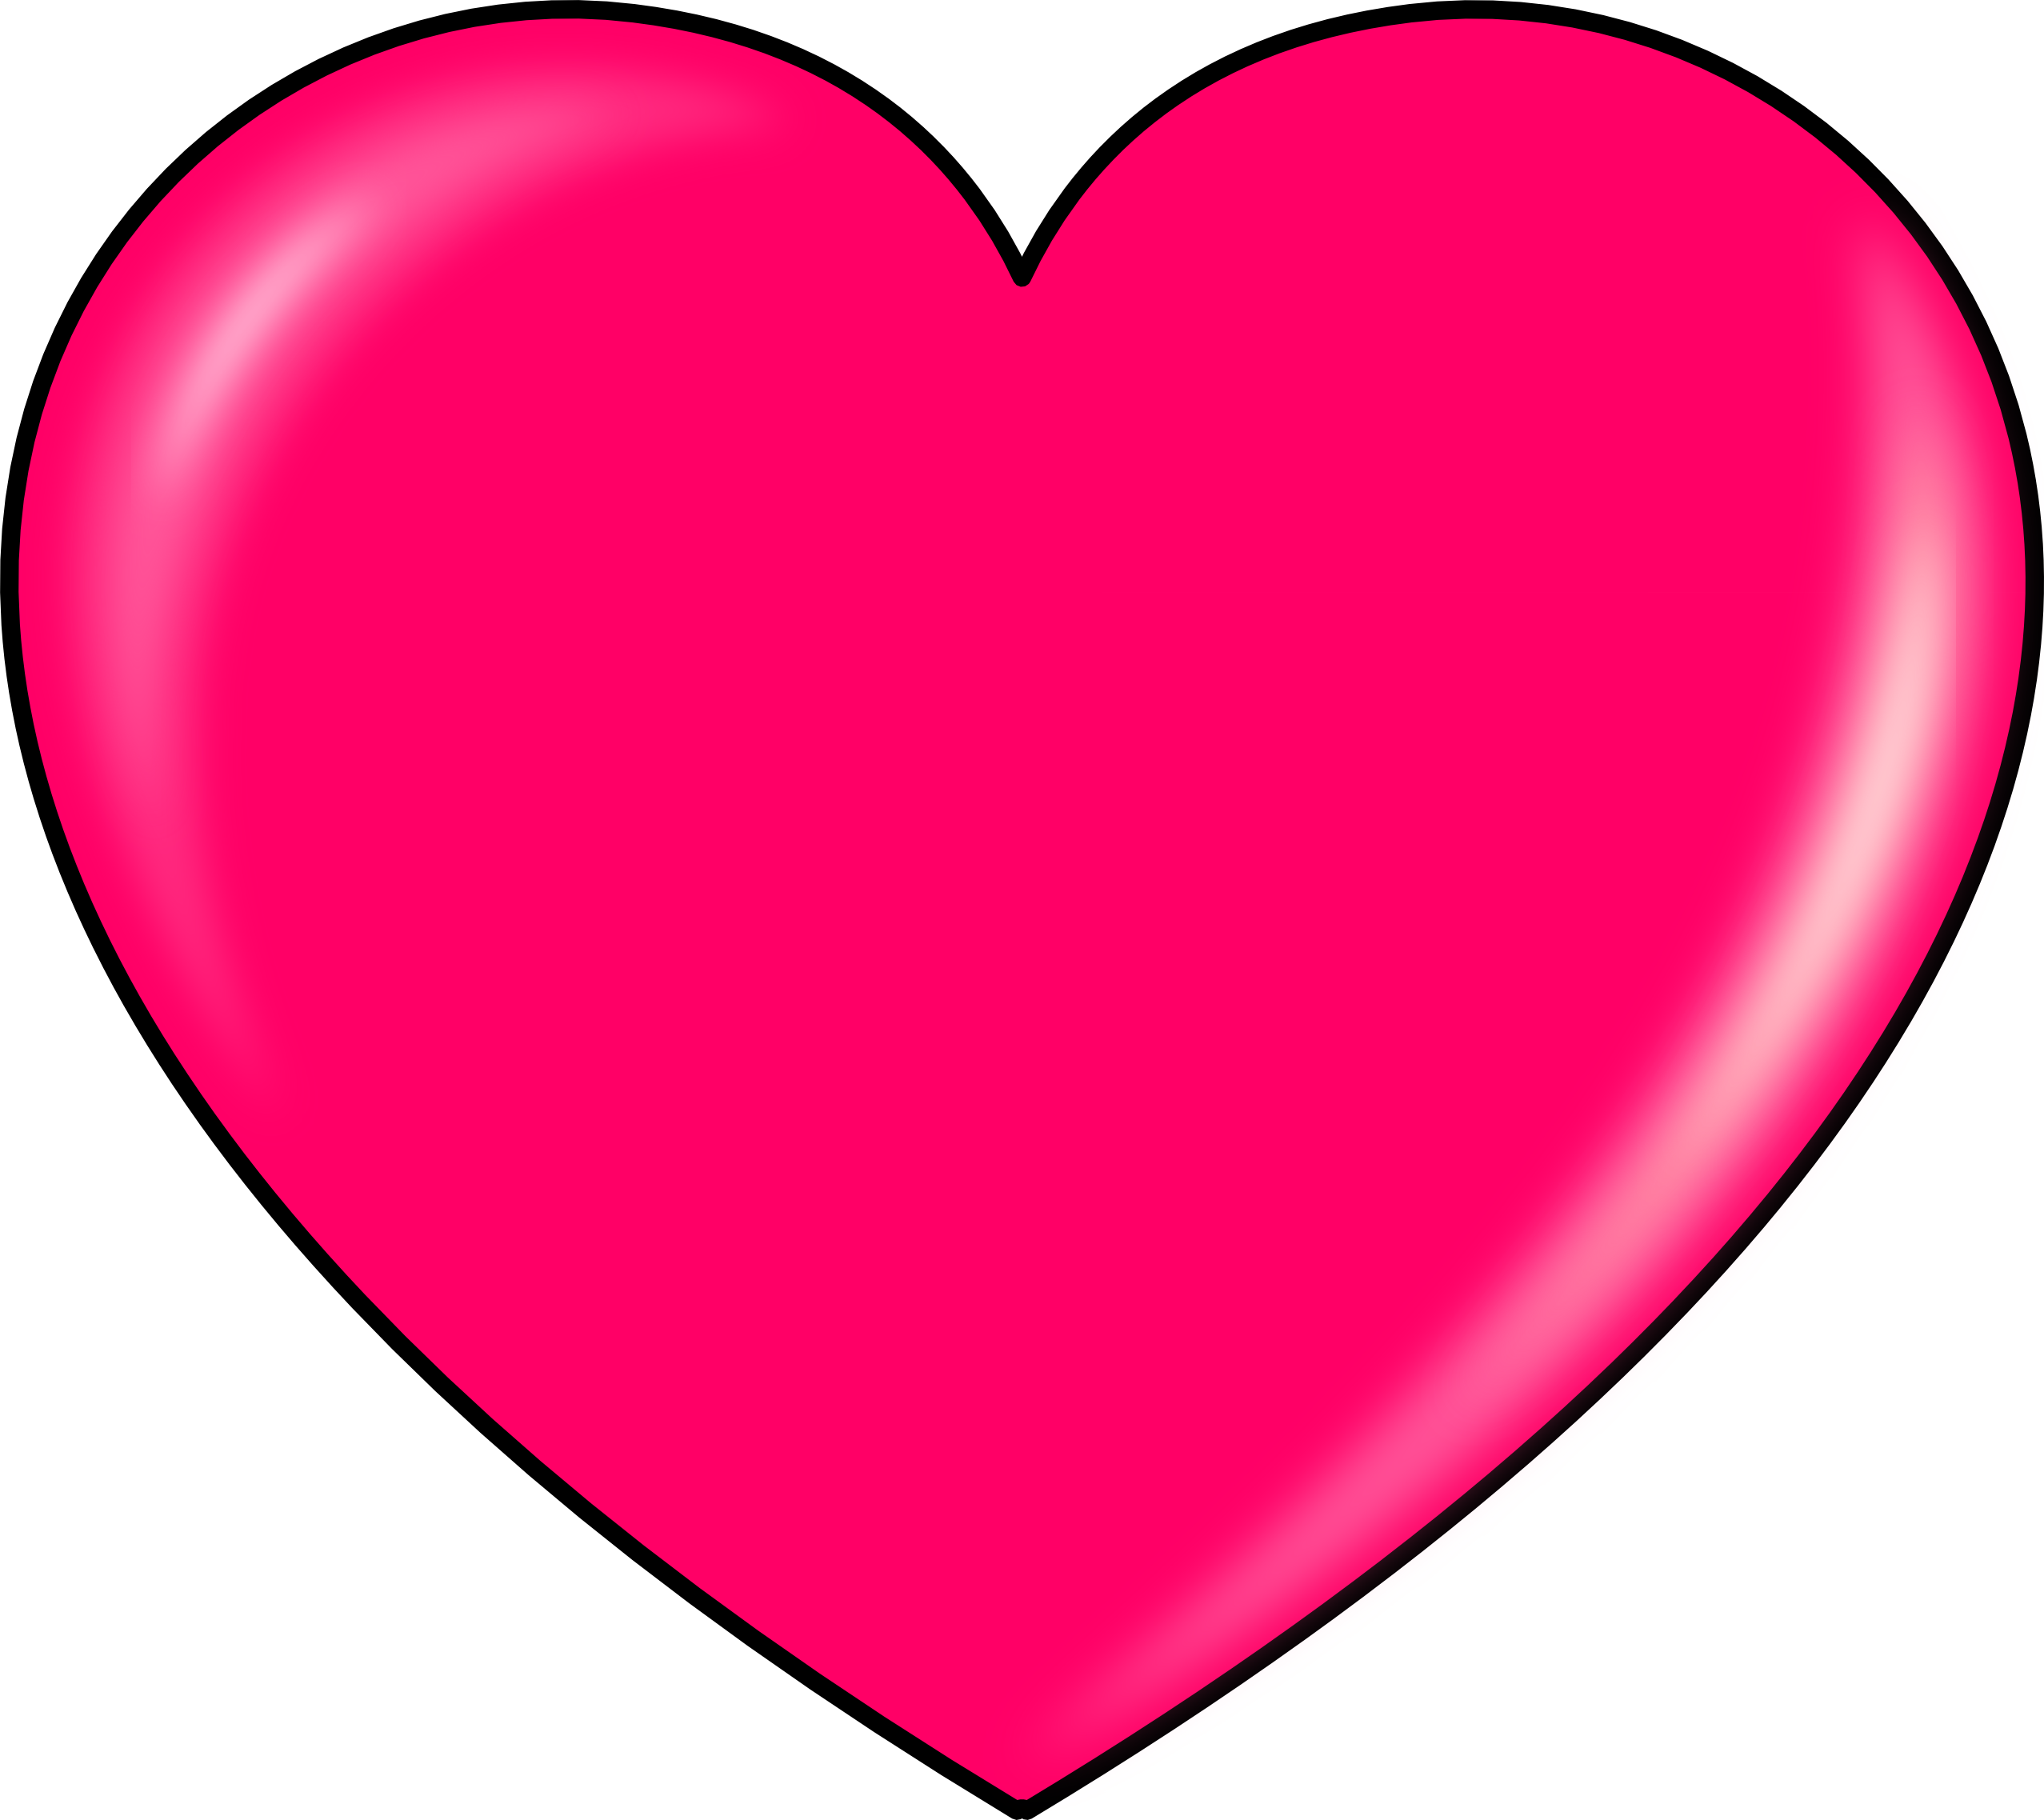 Heart PNG HD - 145158